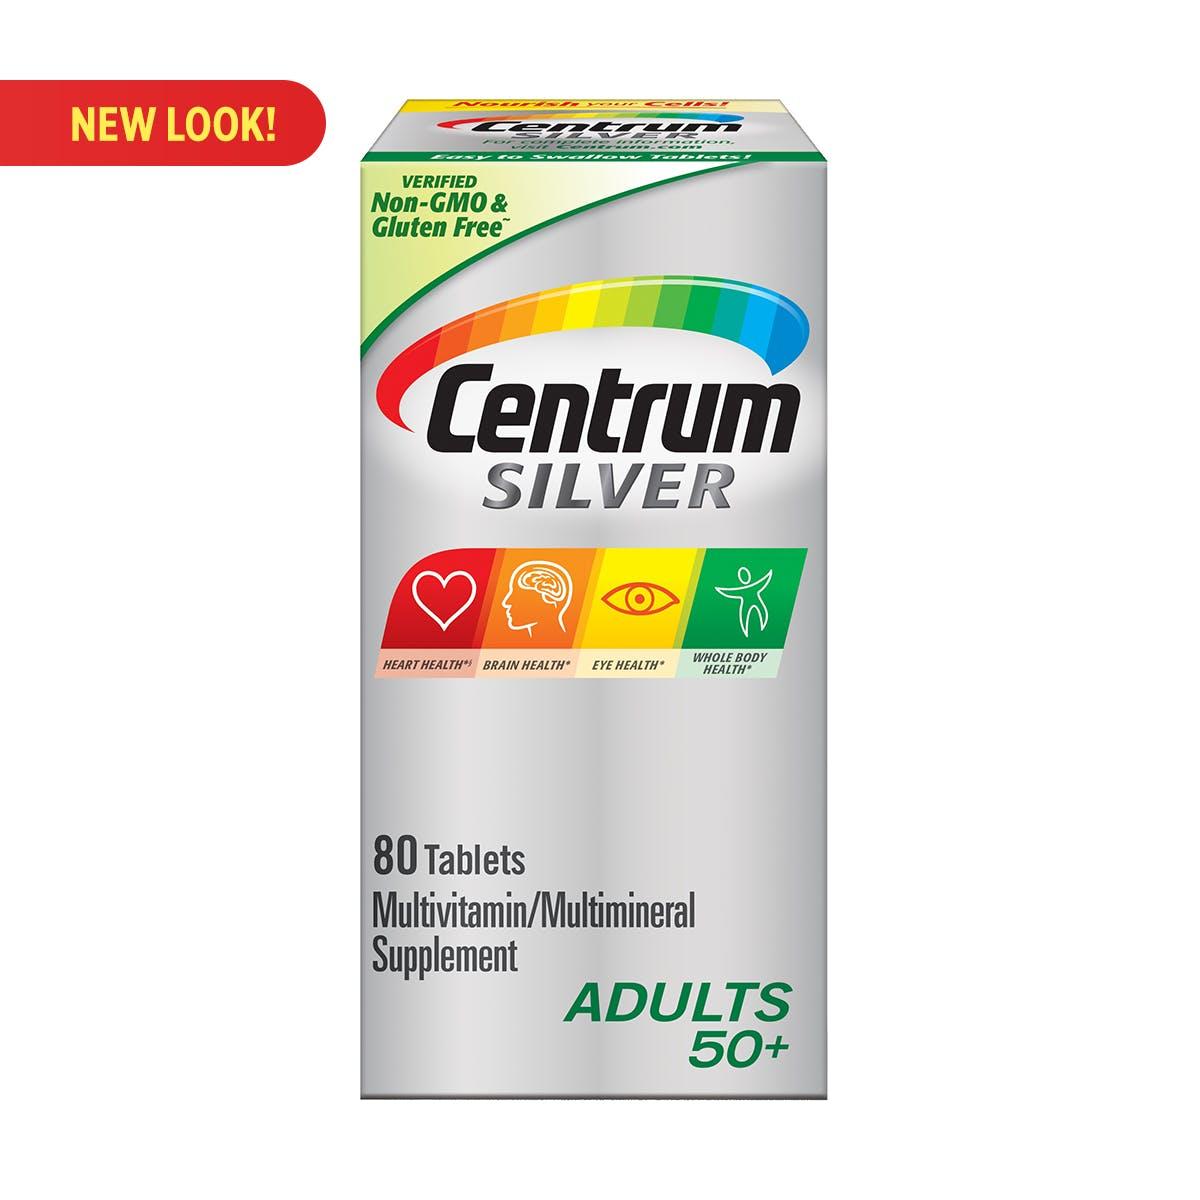 Box of Centrum Silver Adults multivitamins